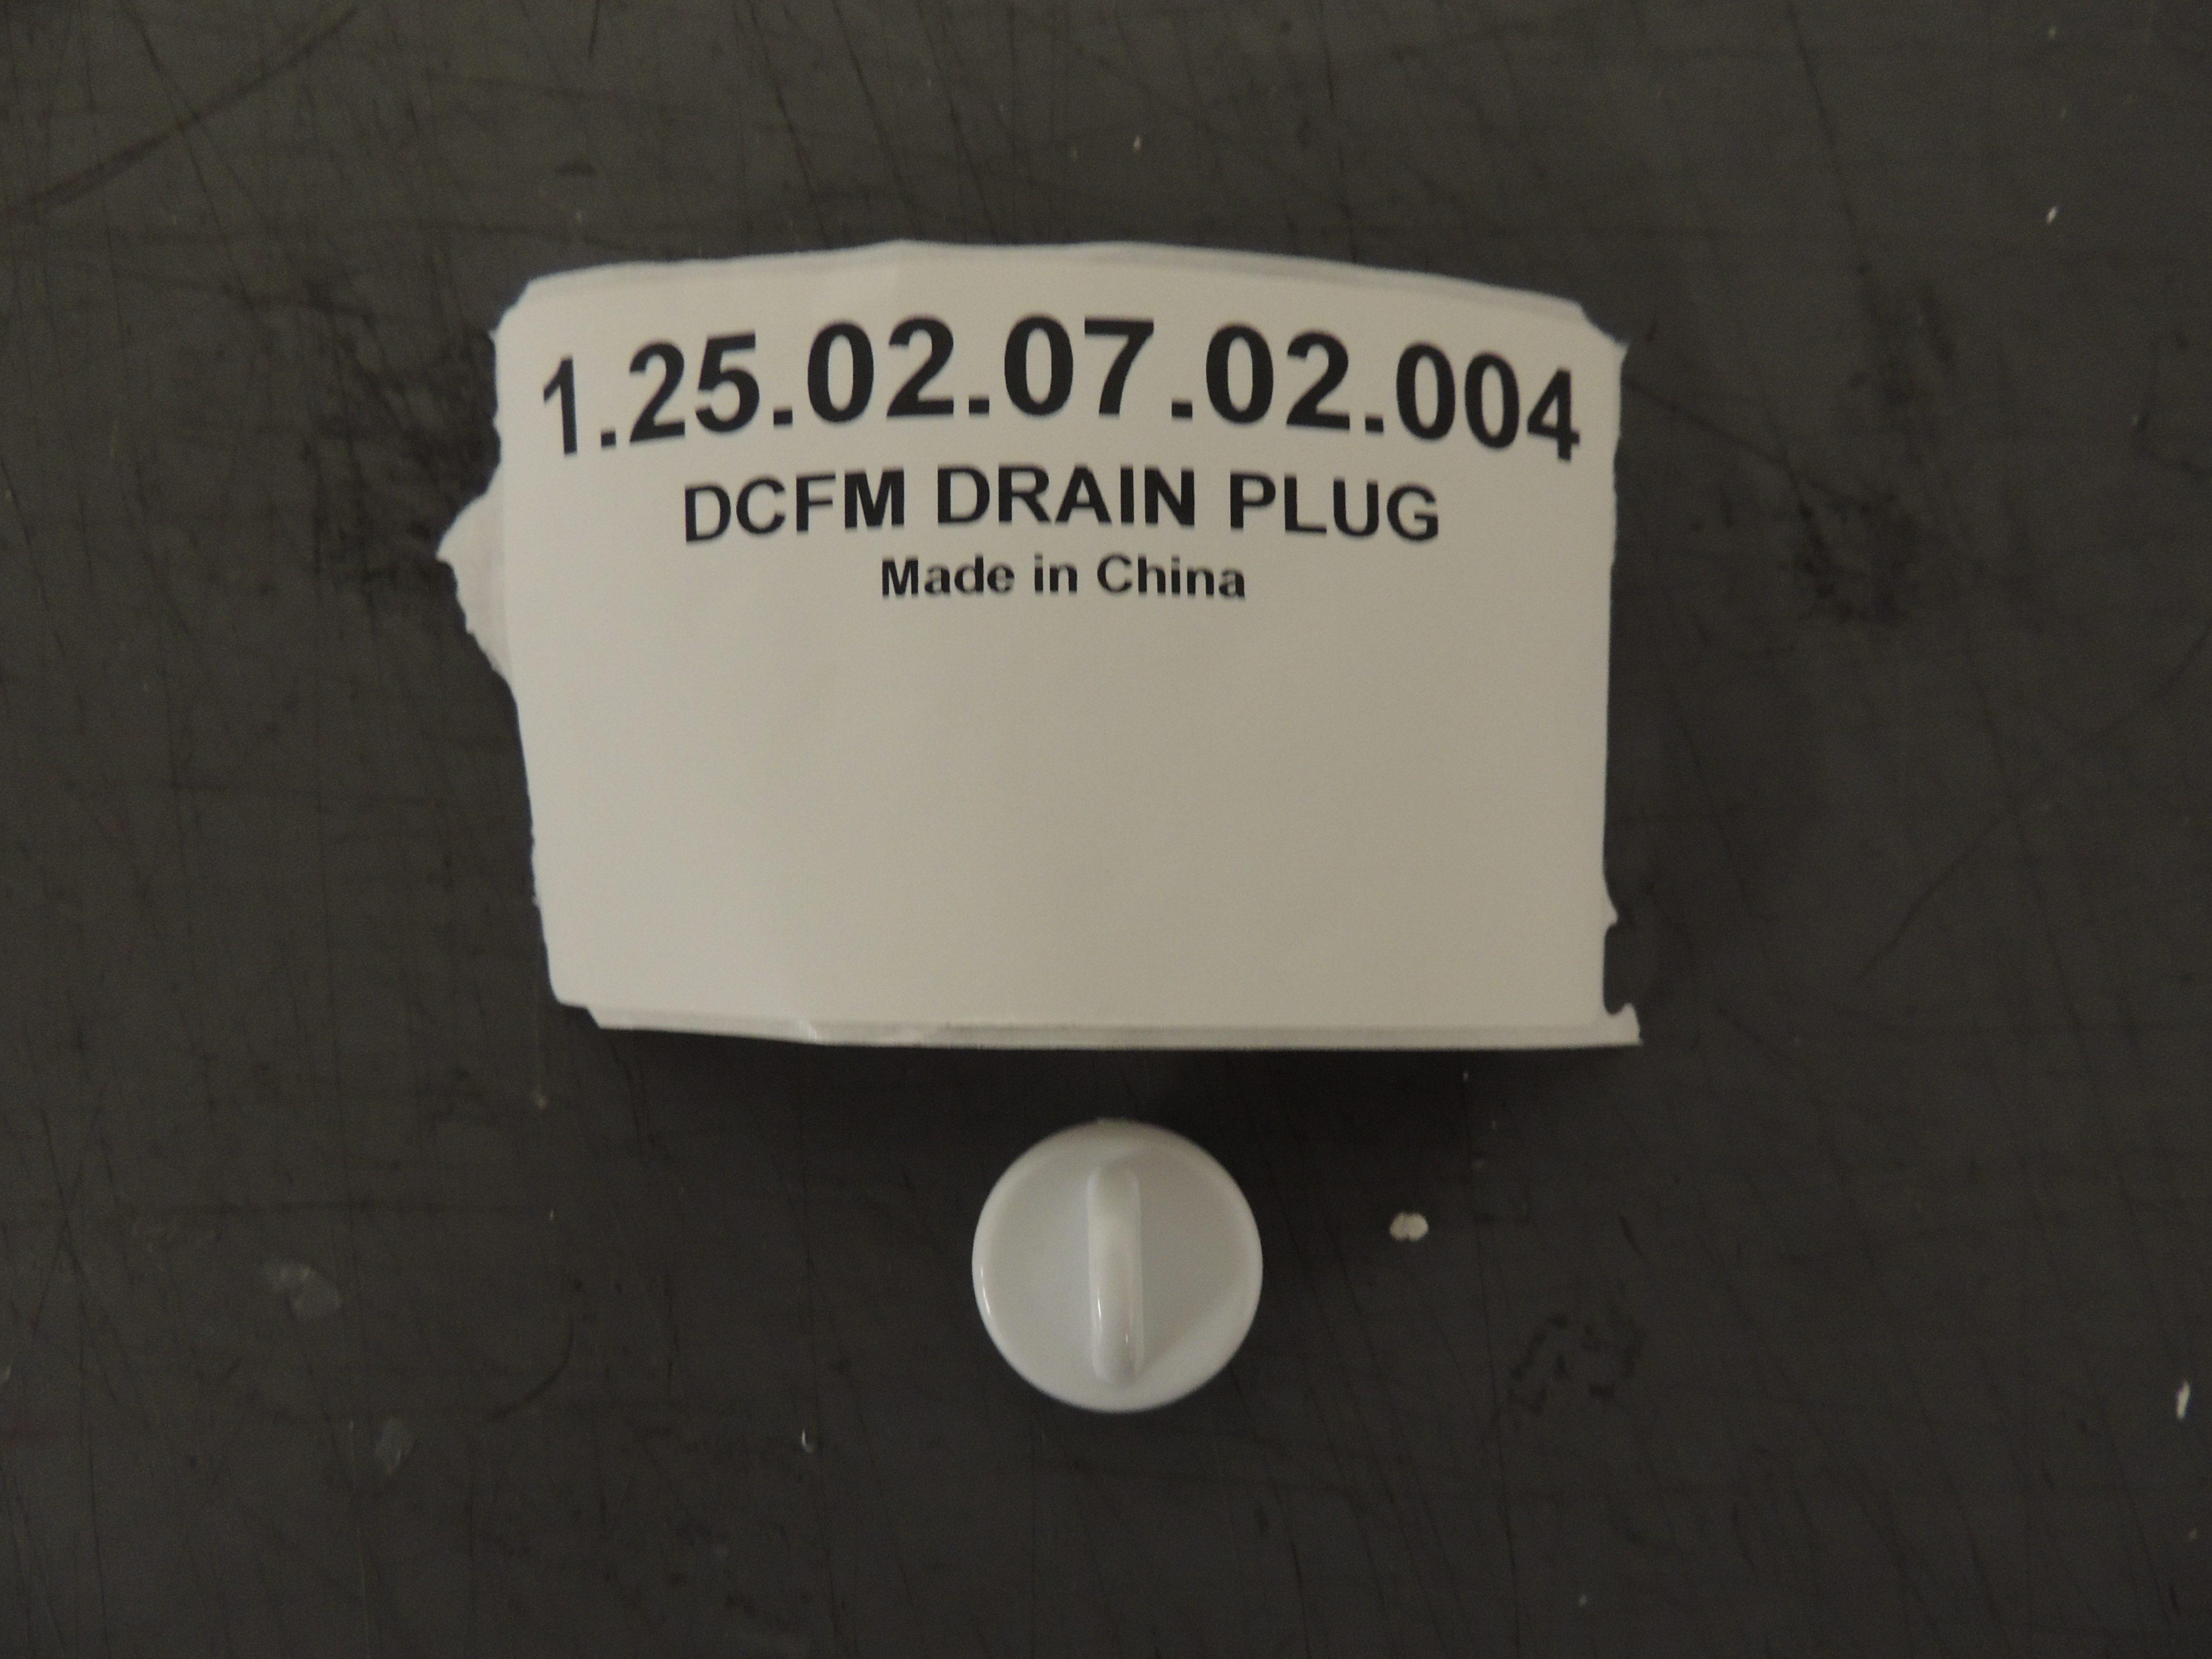 DCFM DRAIN PLUG